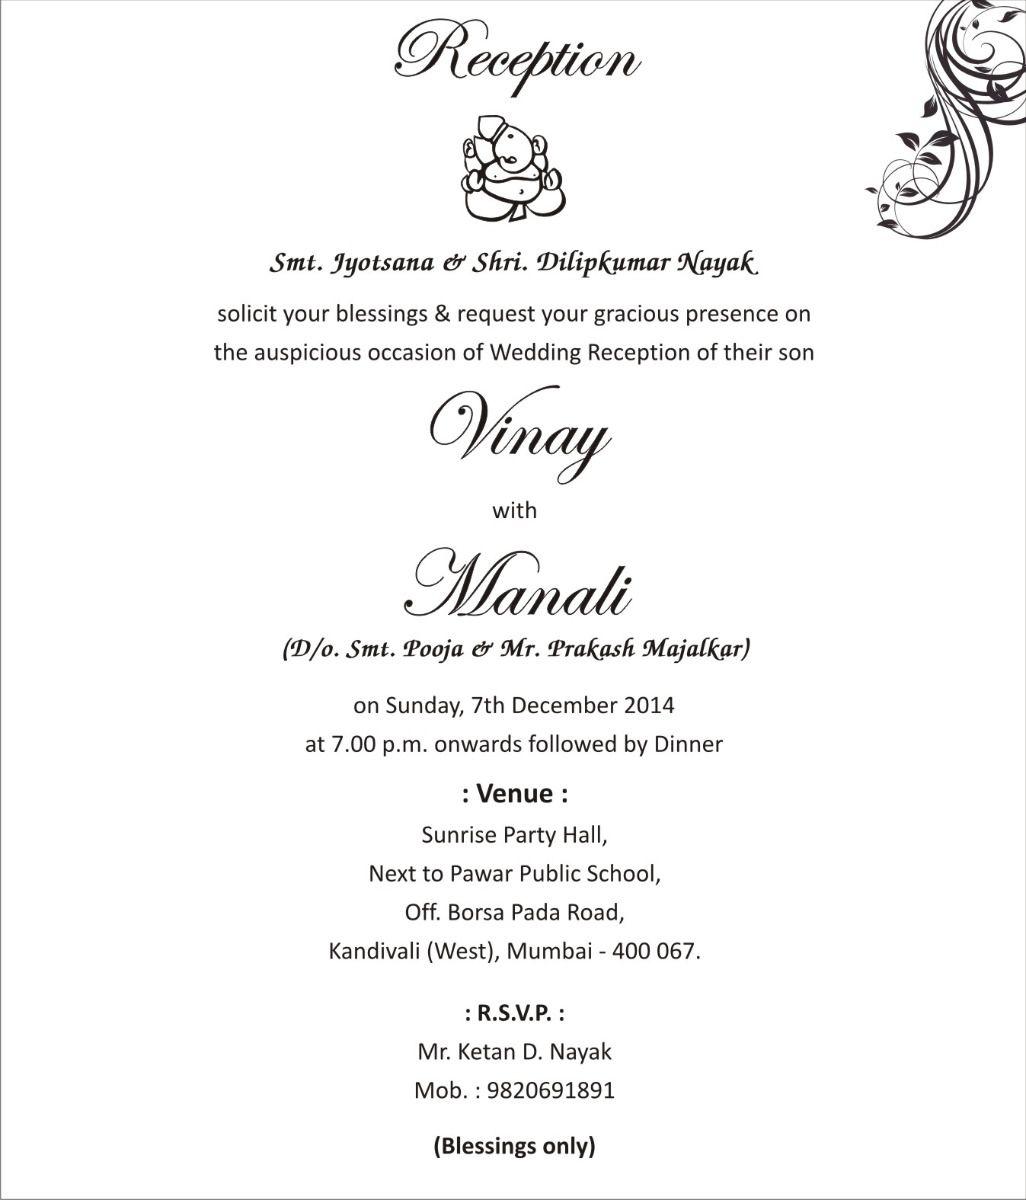 Wedding Reception Invitation Card Format In English in 5